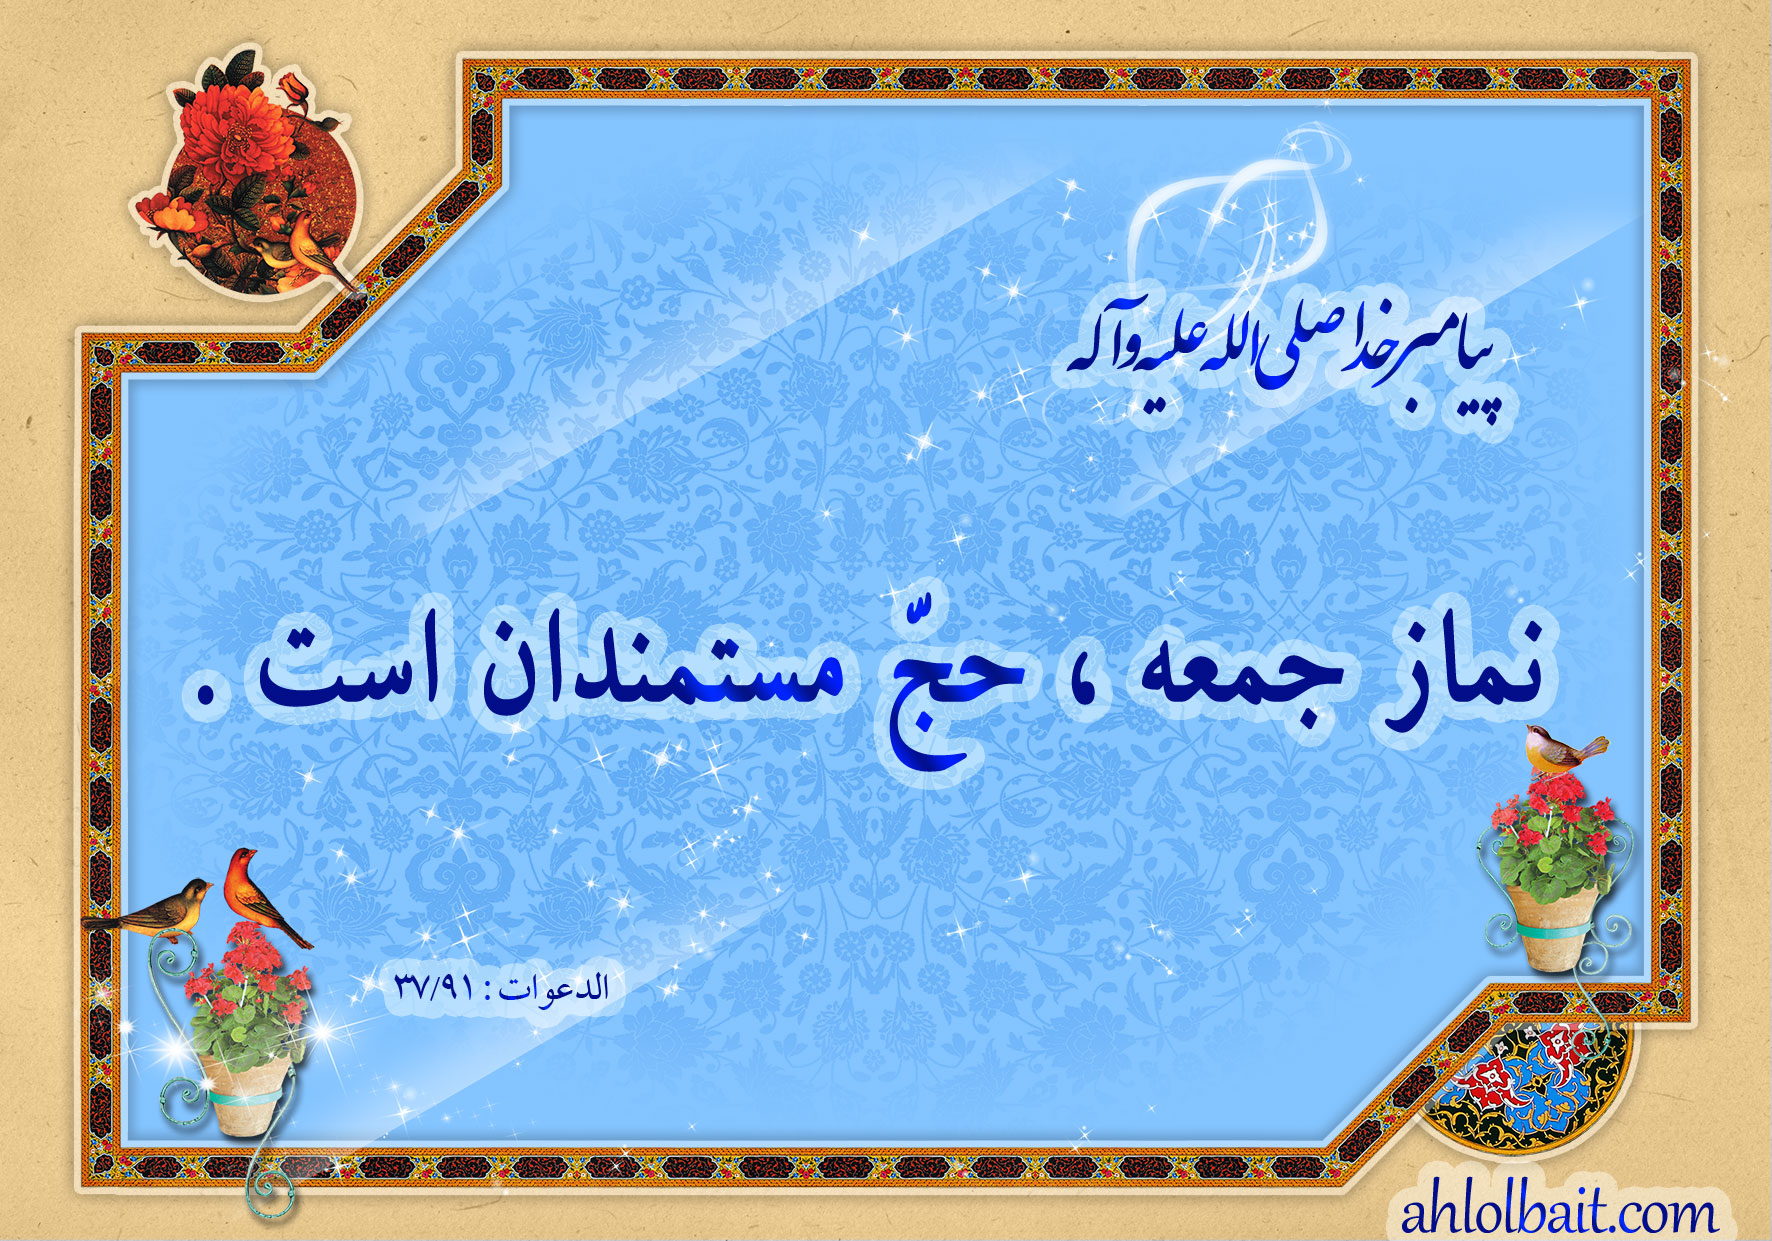 http://ahlolbait.com/files/65/image/namaz_jomeh1.jpg